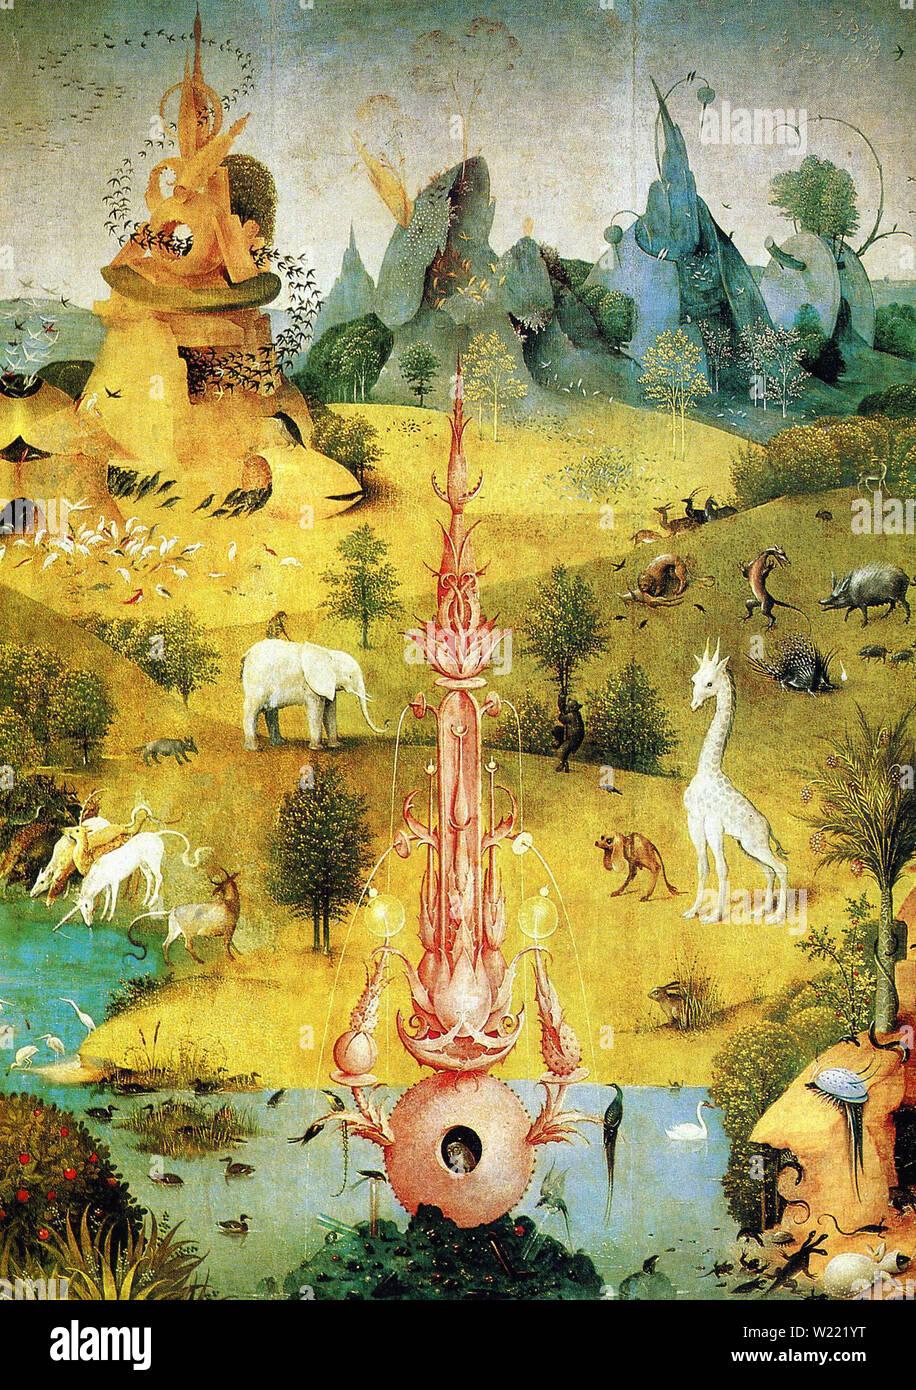 Bosch , Garden Earthly Delights Stock Photo 259430300 , Alamy